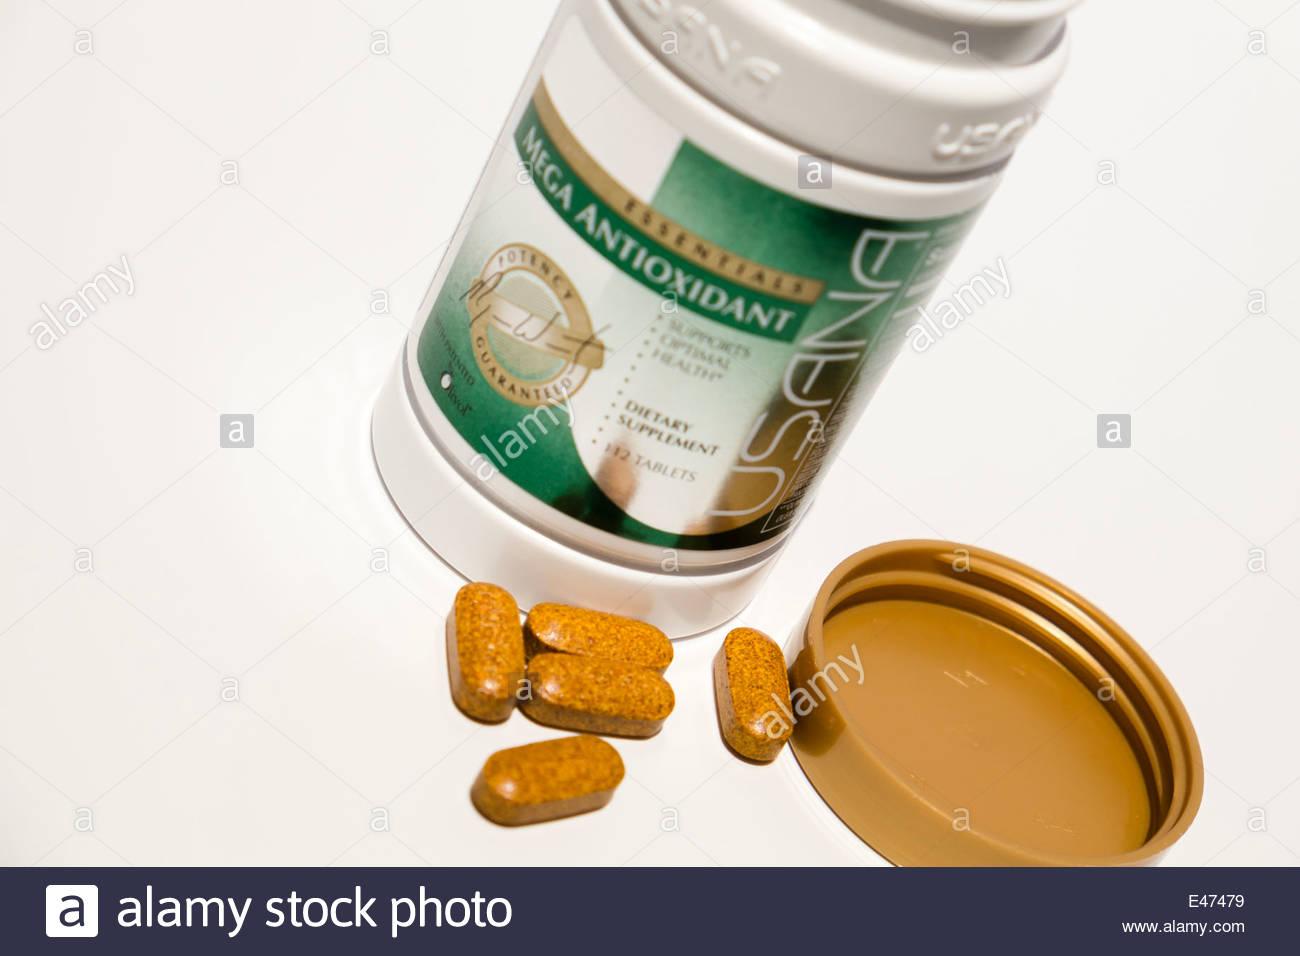 mega antioxidant tablets Usana brand on tabletop - Stock Image